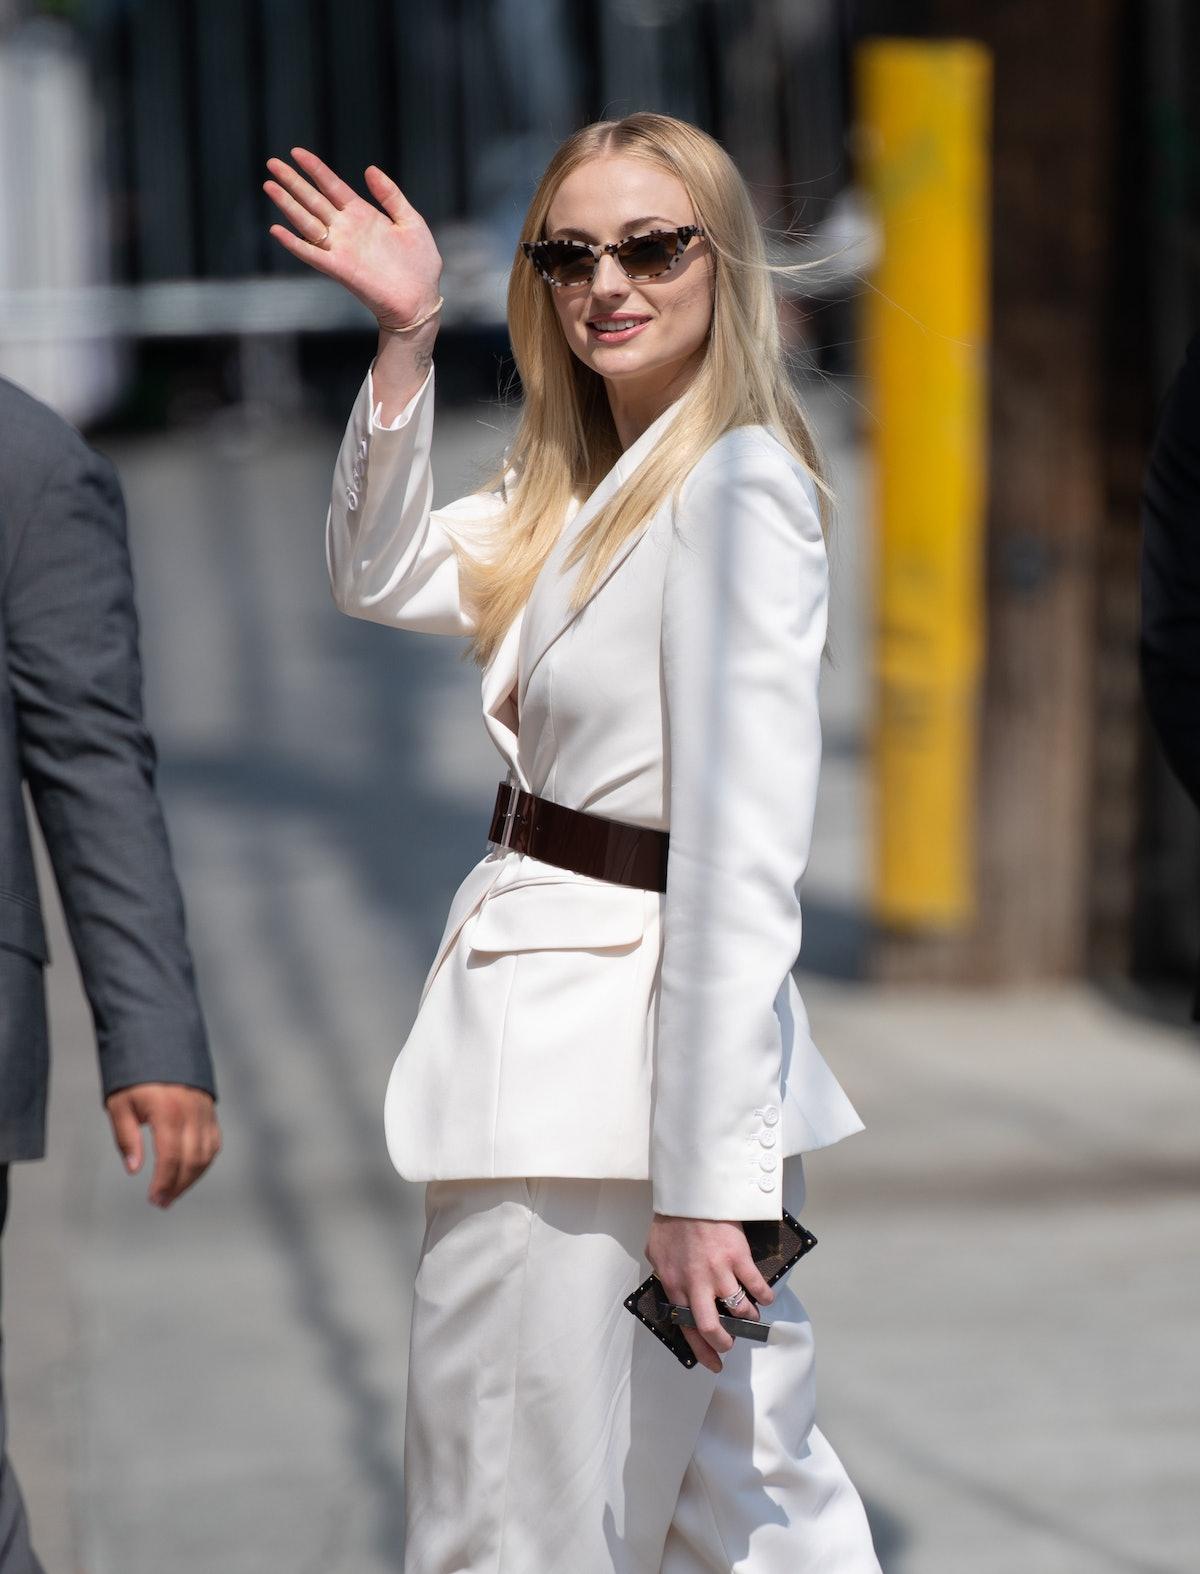 Sophie Turner is seen at 'Jimmy Kimmel Live' on June 4, 2019 in Los Angeles, California.